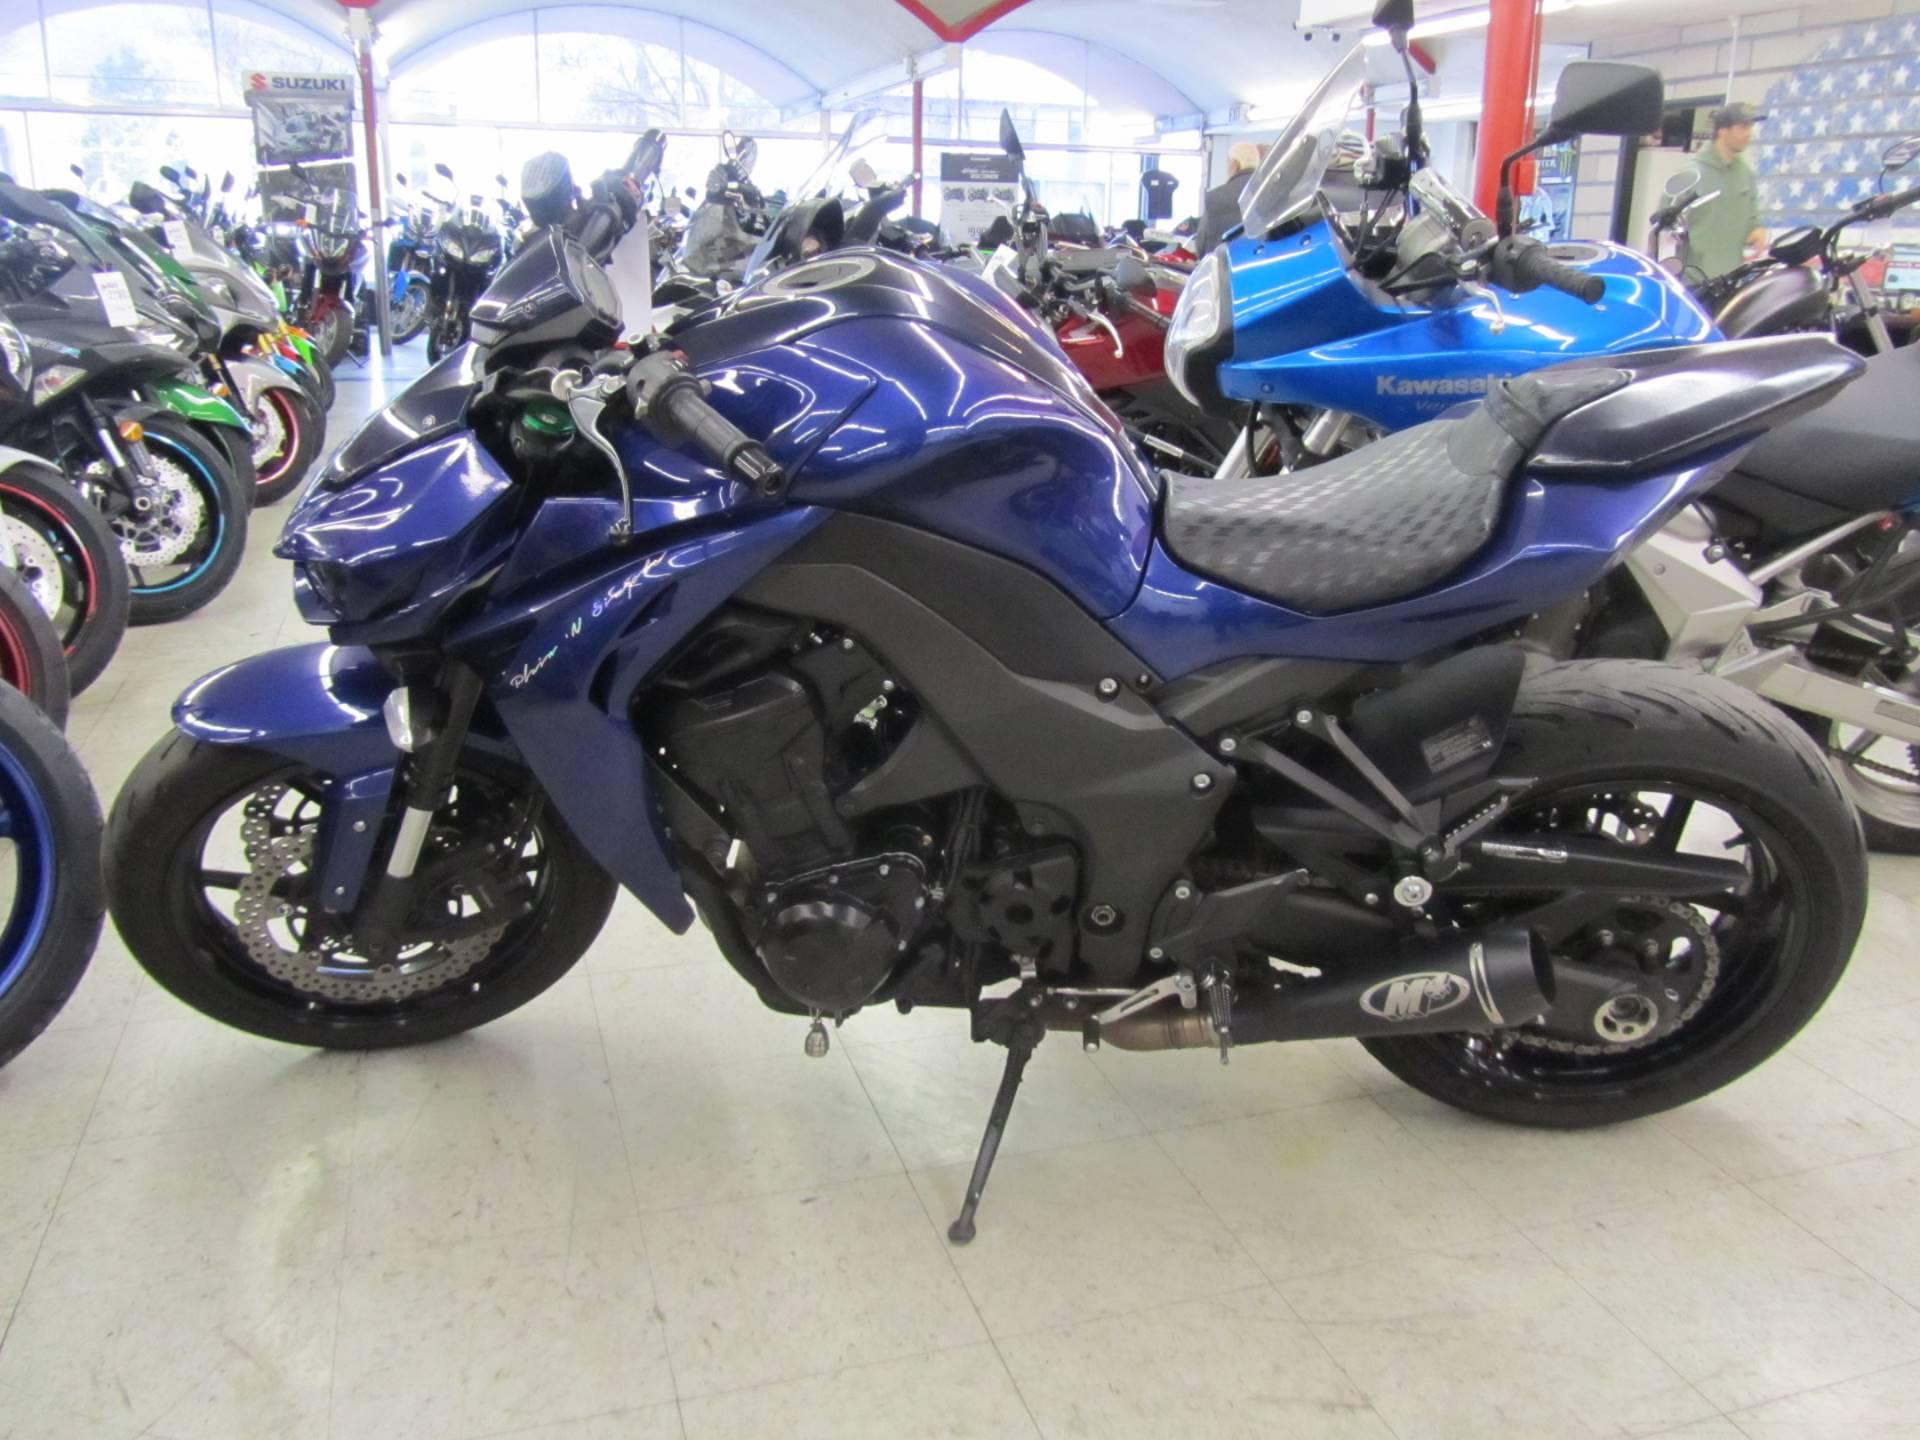 Used 2016 Kawasaki Z1000 Abs Motorcycles In Colorado Springs Co